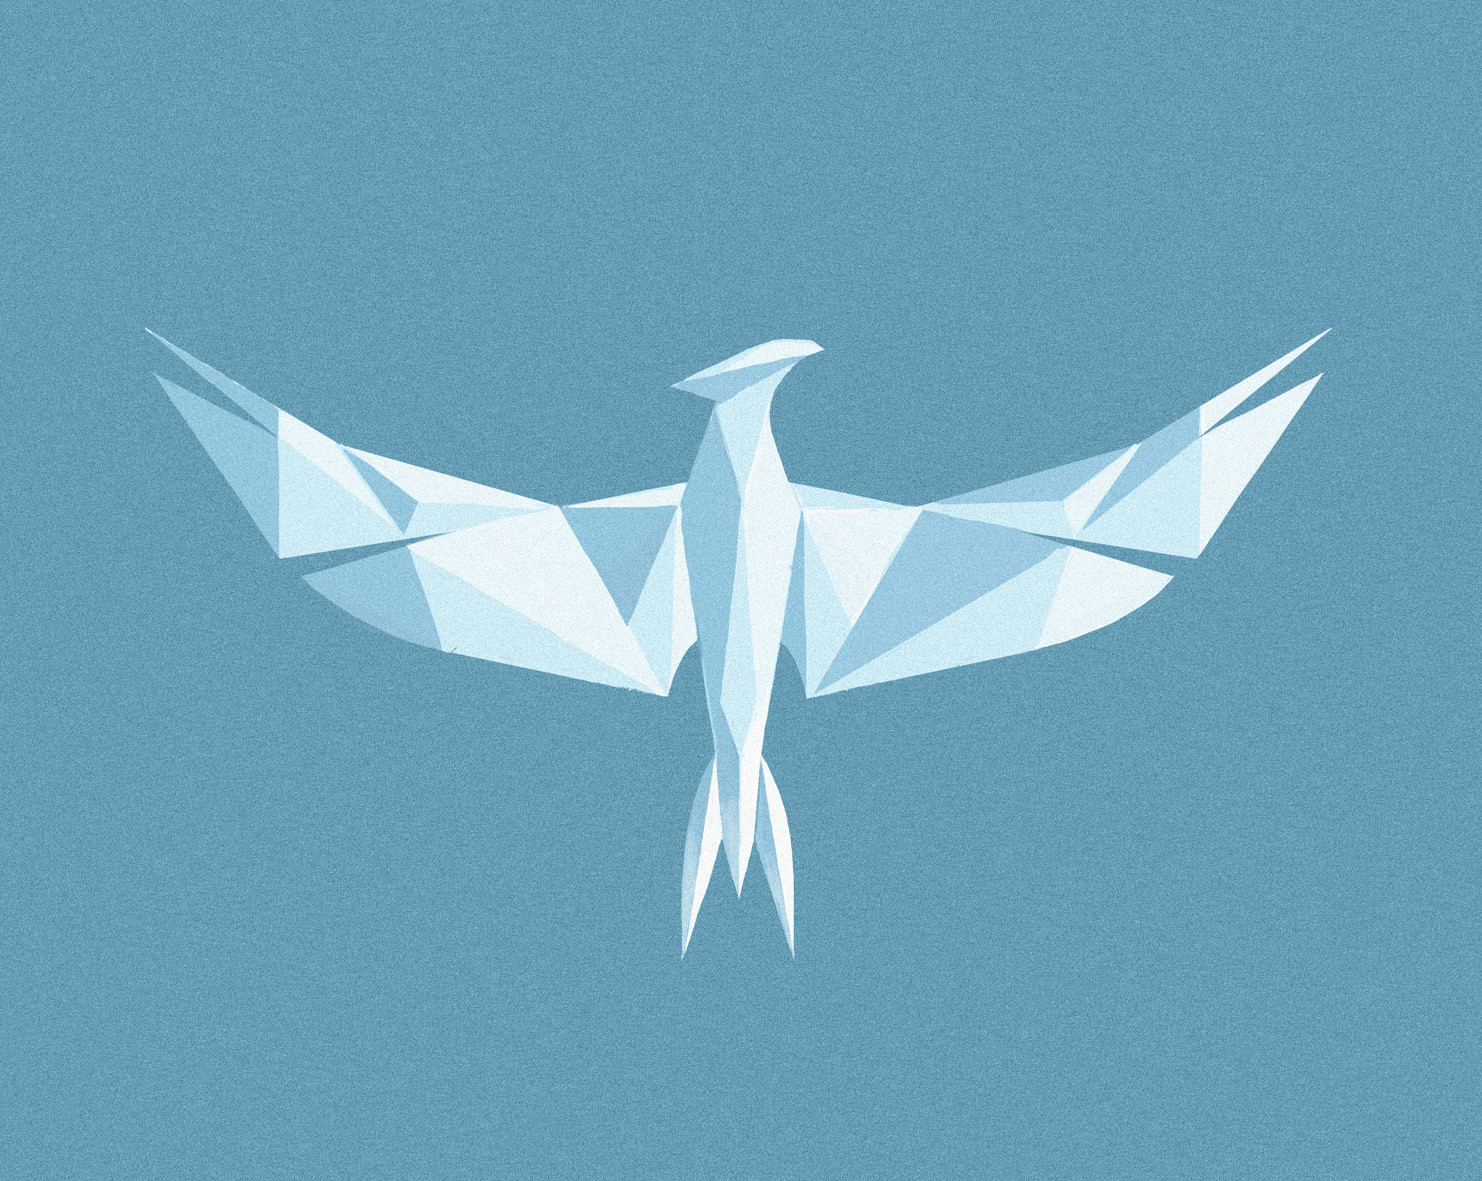 Renaud roche rgt phoenix web